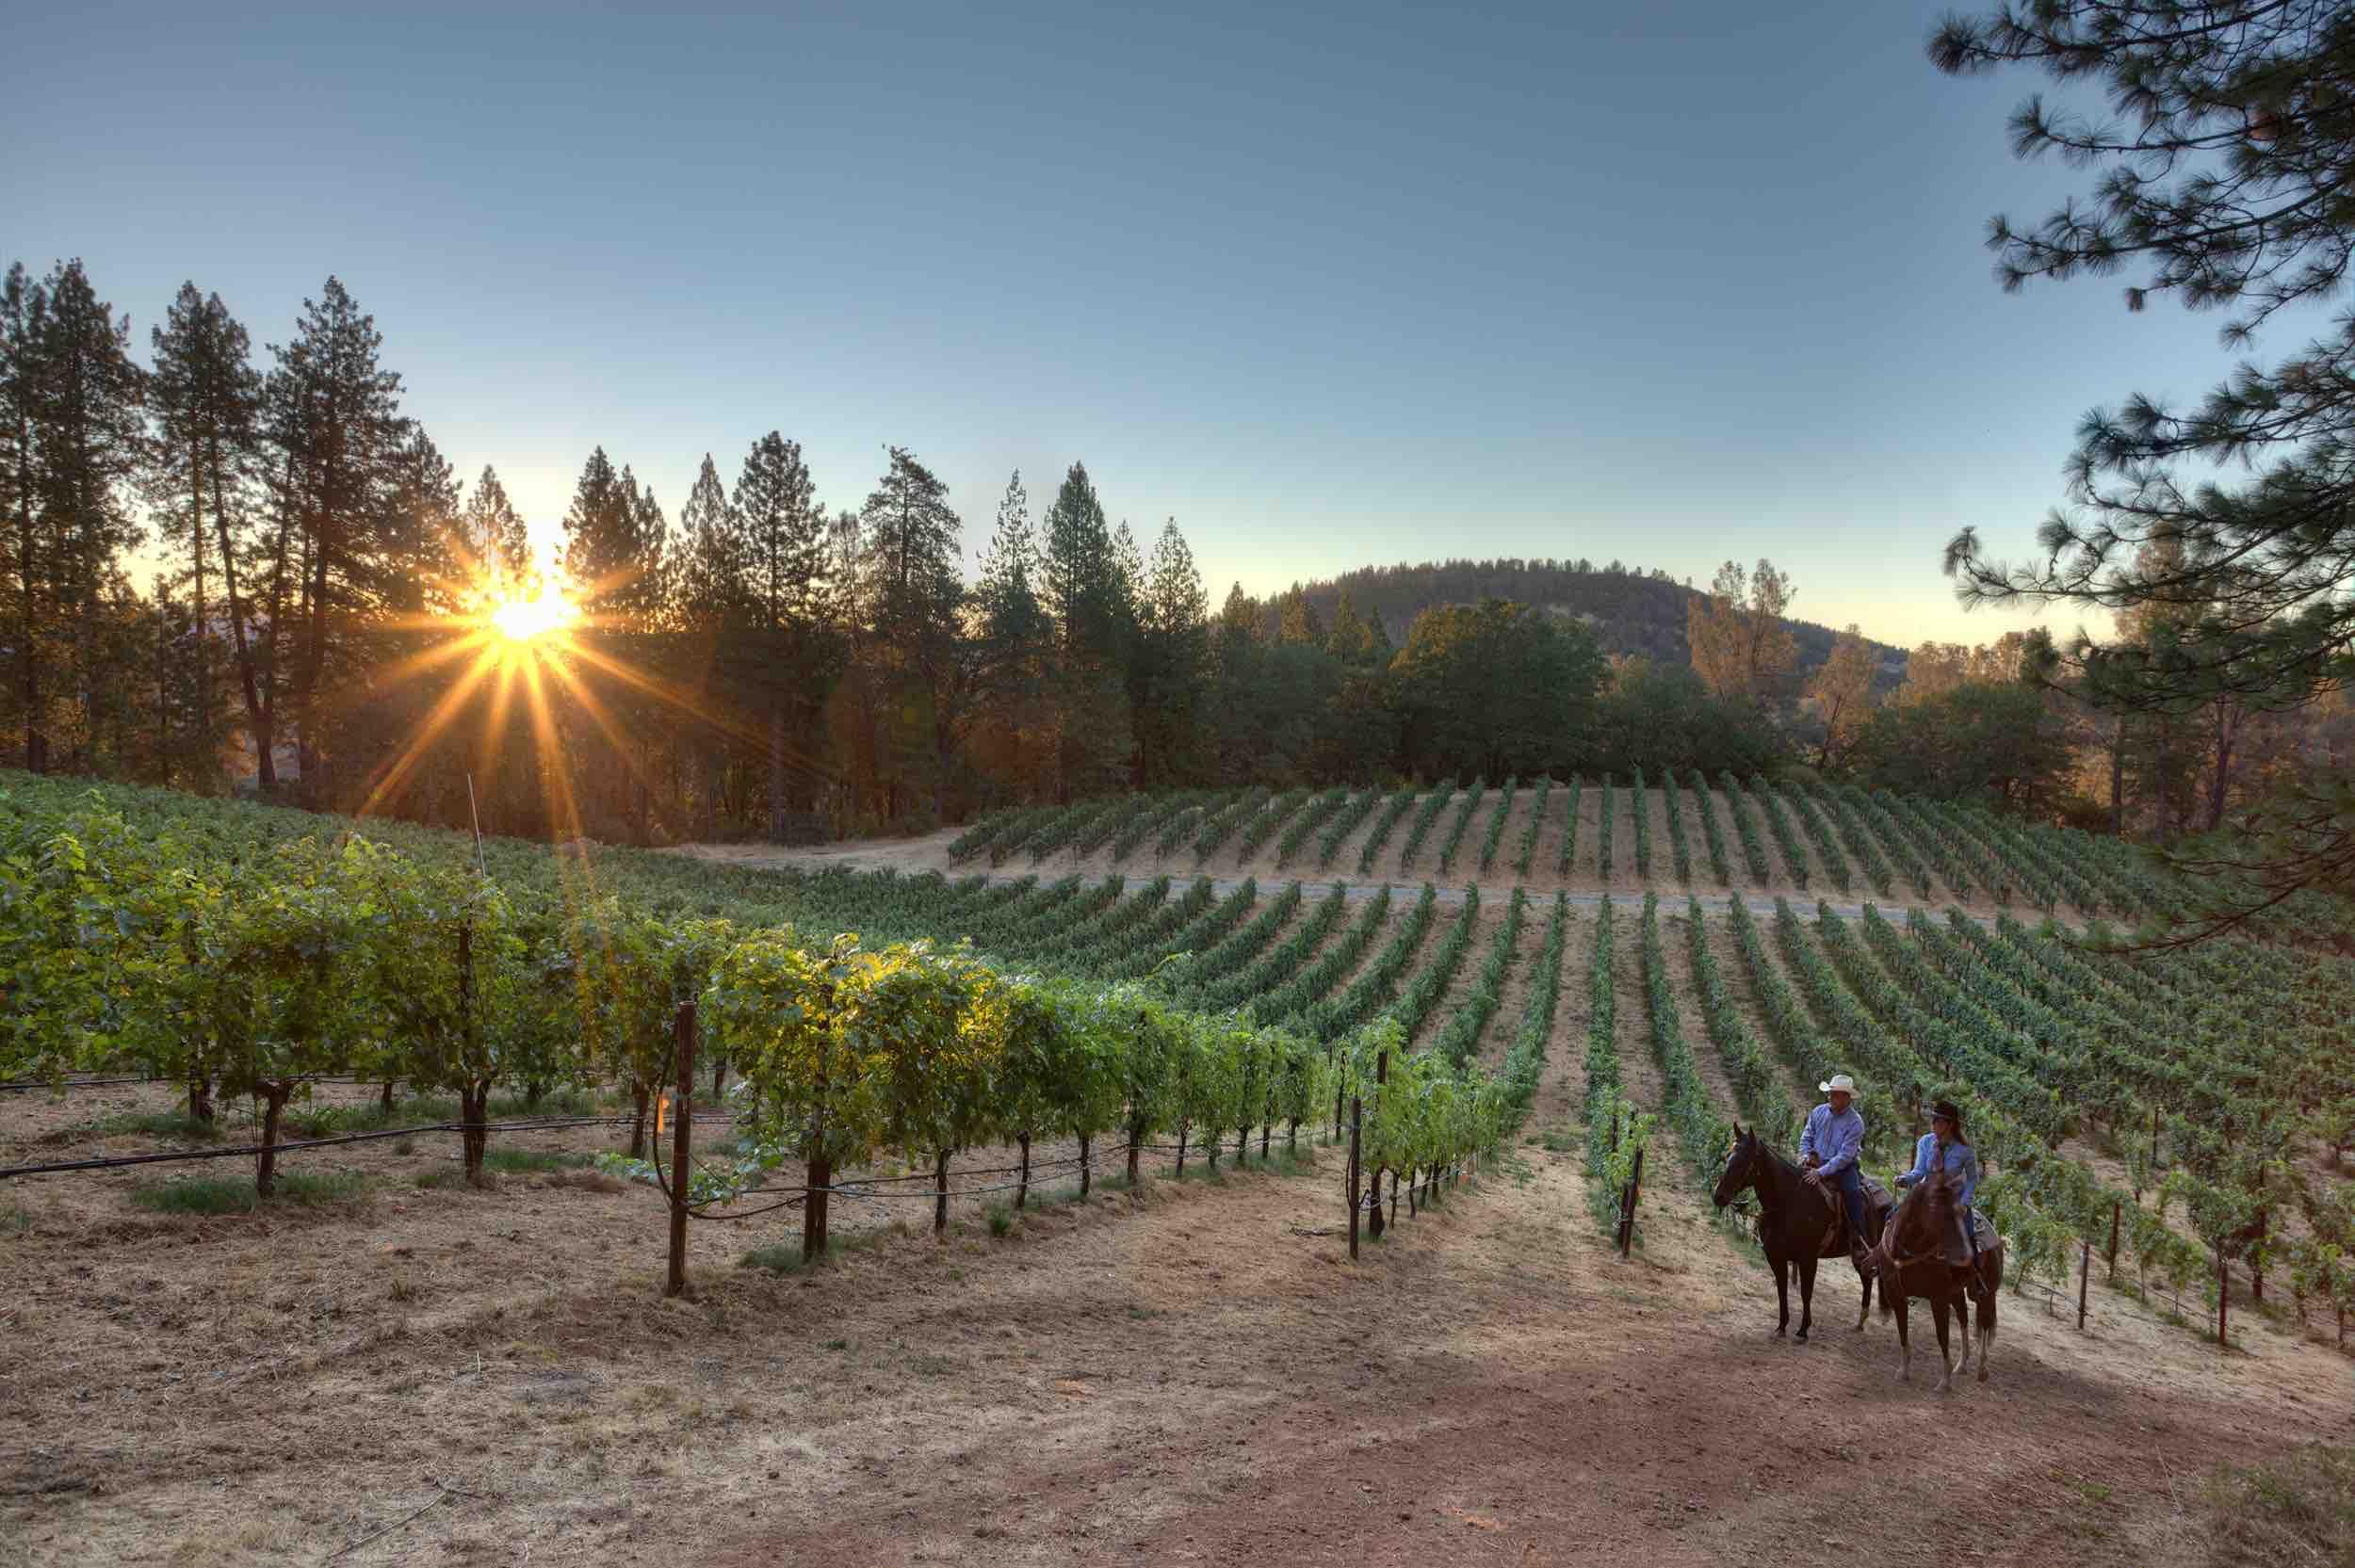 Mitch and Tracey Hawkins on horseback in vineyard